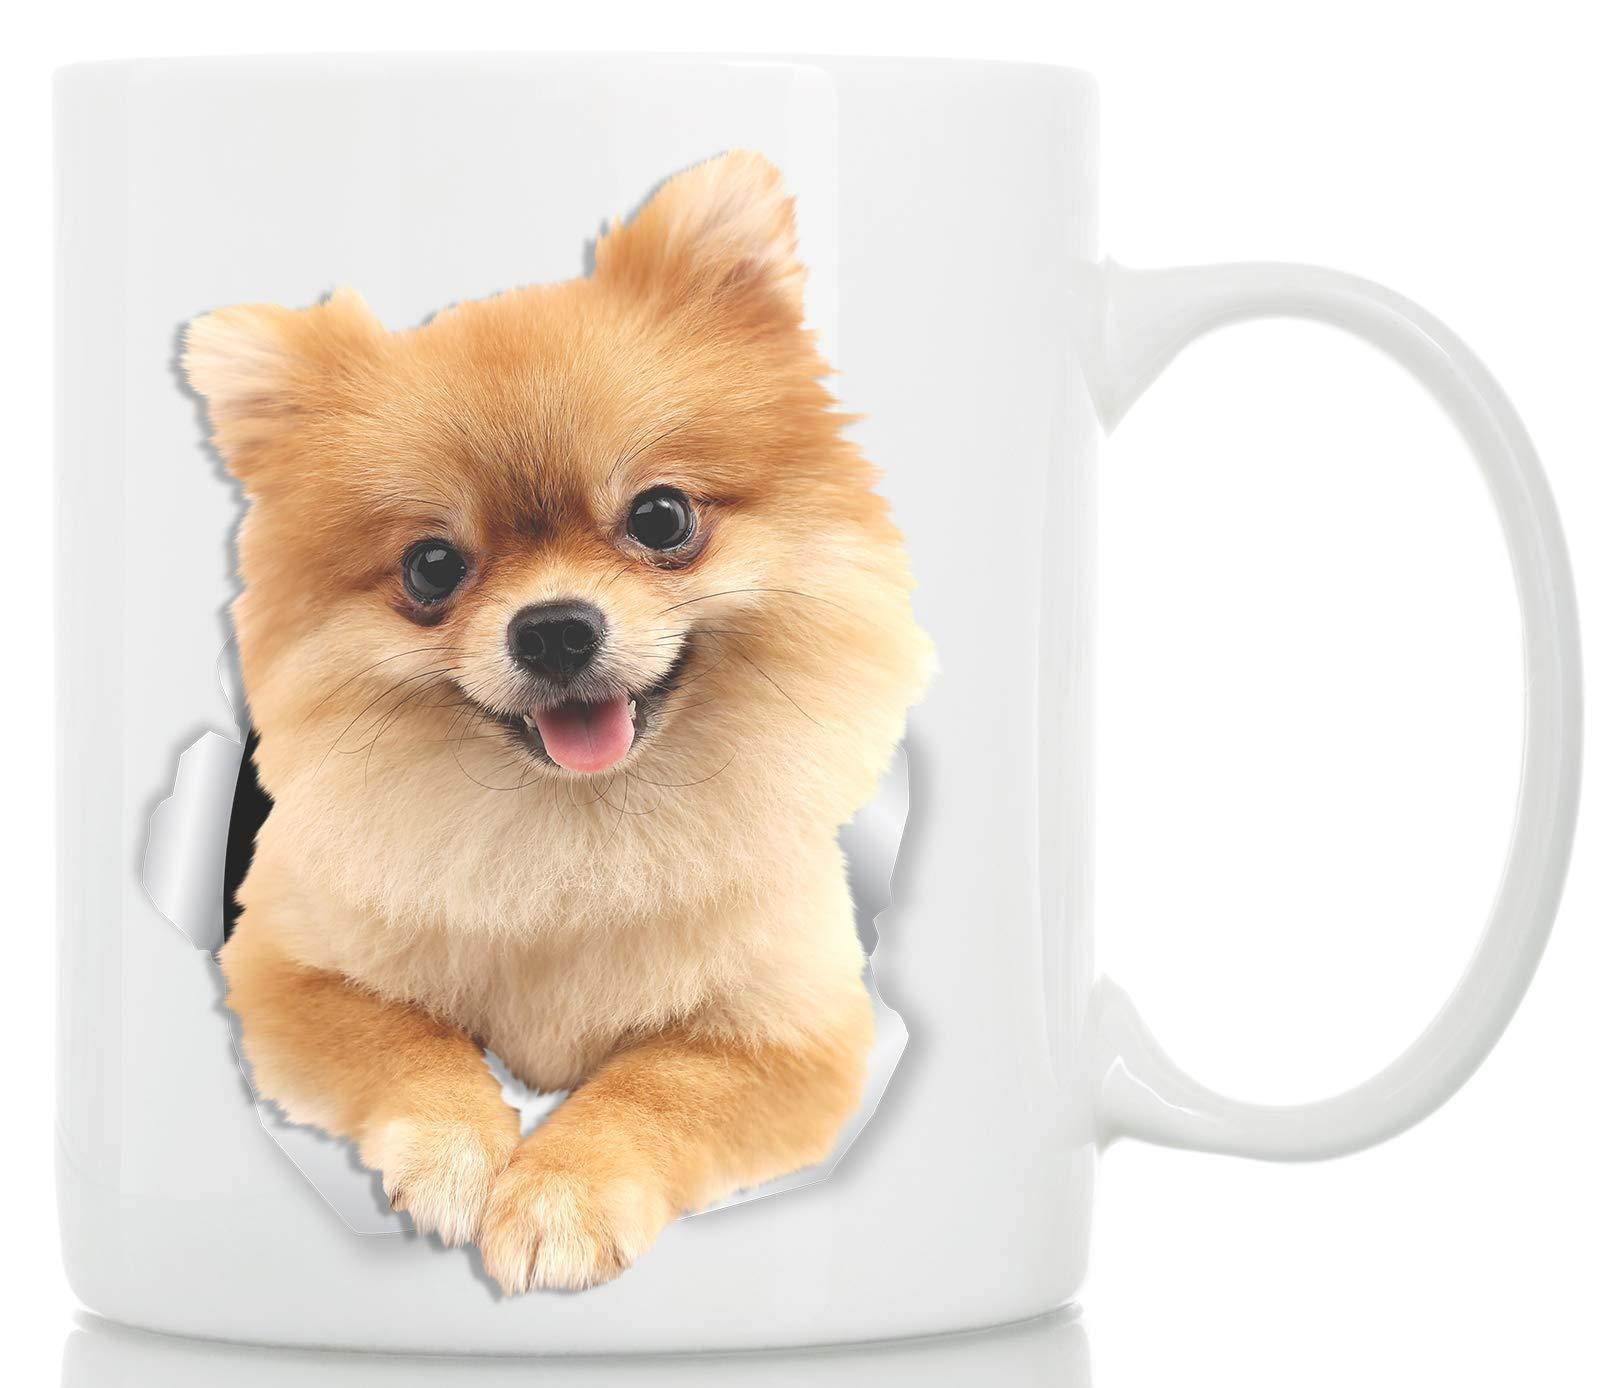 Cute Pomeranian Coffee Mug - German Spitz Ceramic Mug - Perfect Pomeranian Gifts for Dog Lover - Cute PomPom Cup for Pomeranian Mom and Dad - Great Birthday or Christmas Present for Dog Owner (11oz) 1